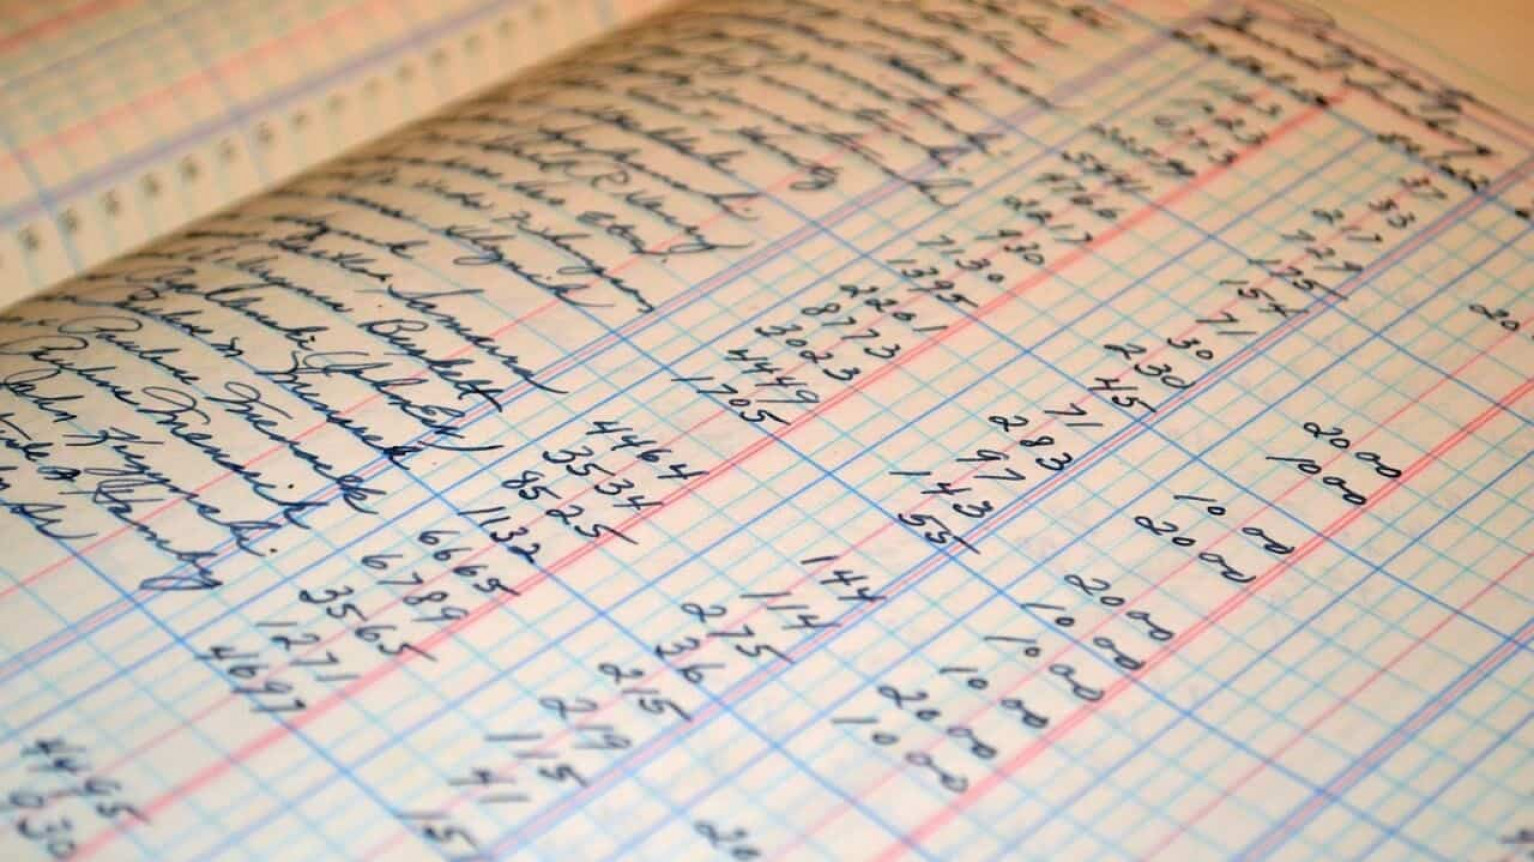 Image of a balance sheet lending book